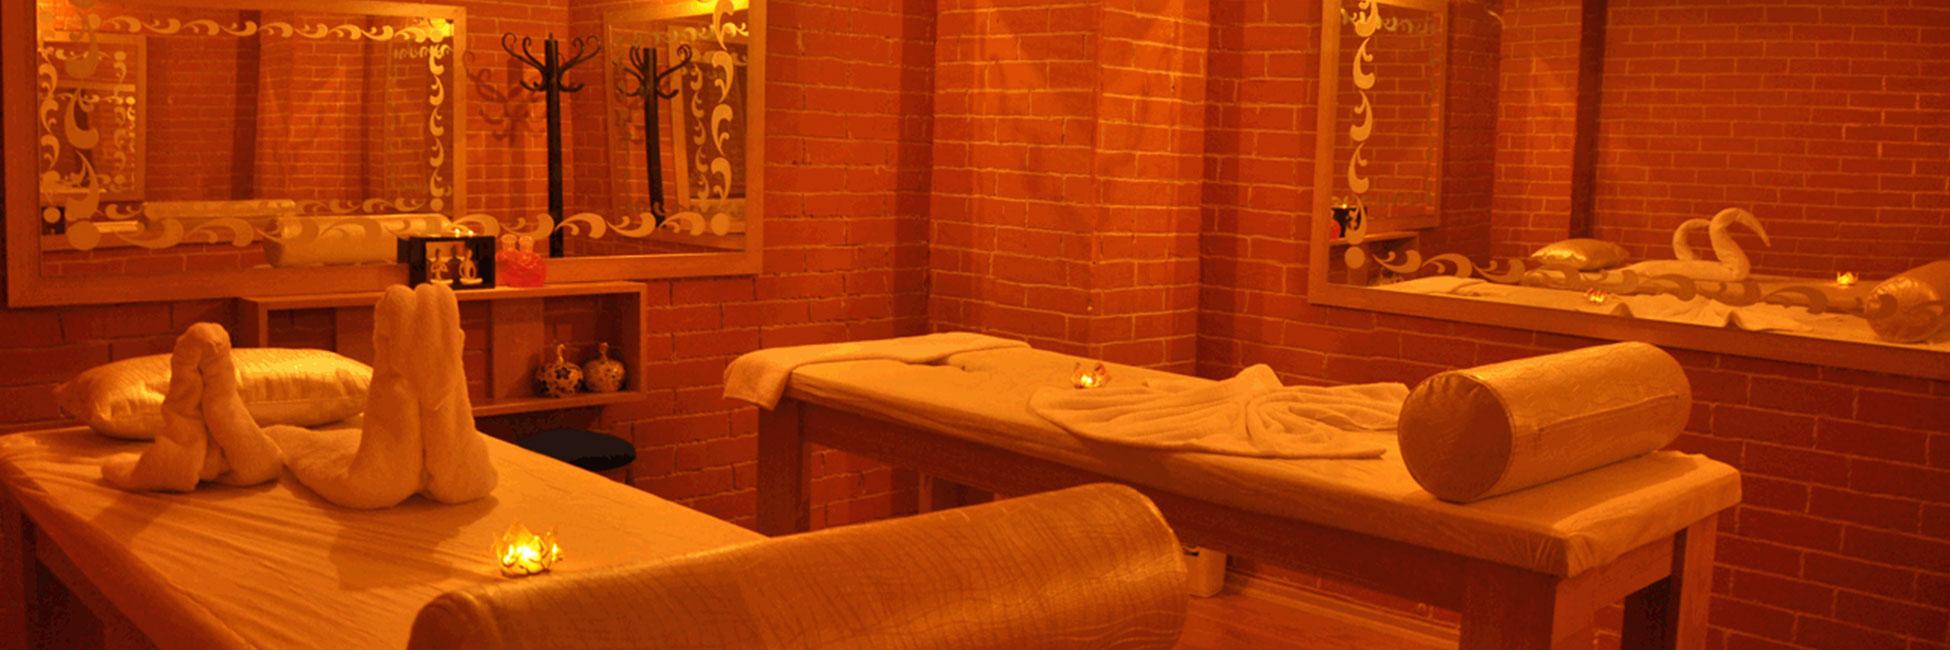 beylikduzu-masaj-salonu